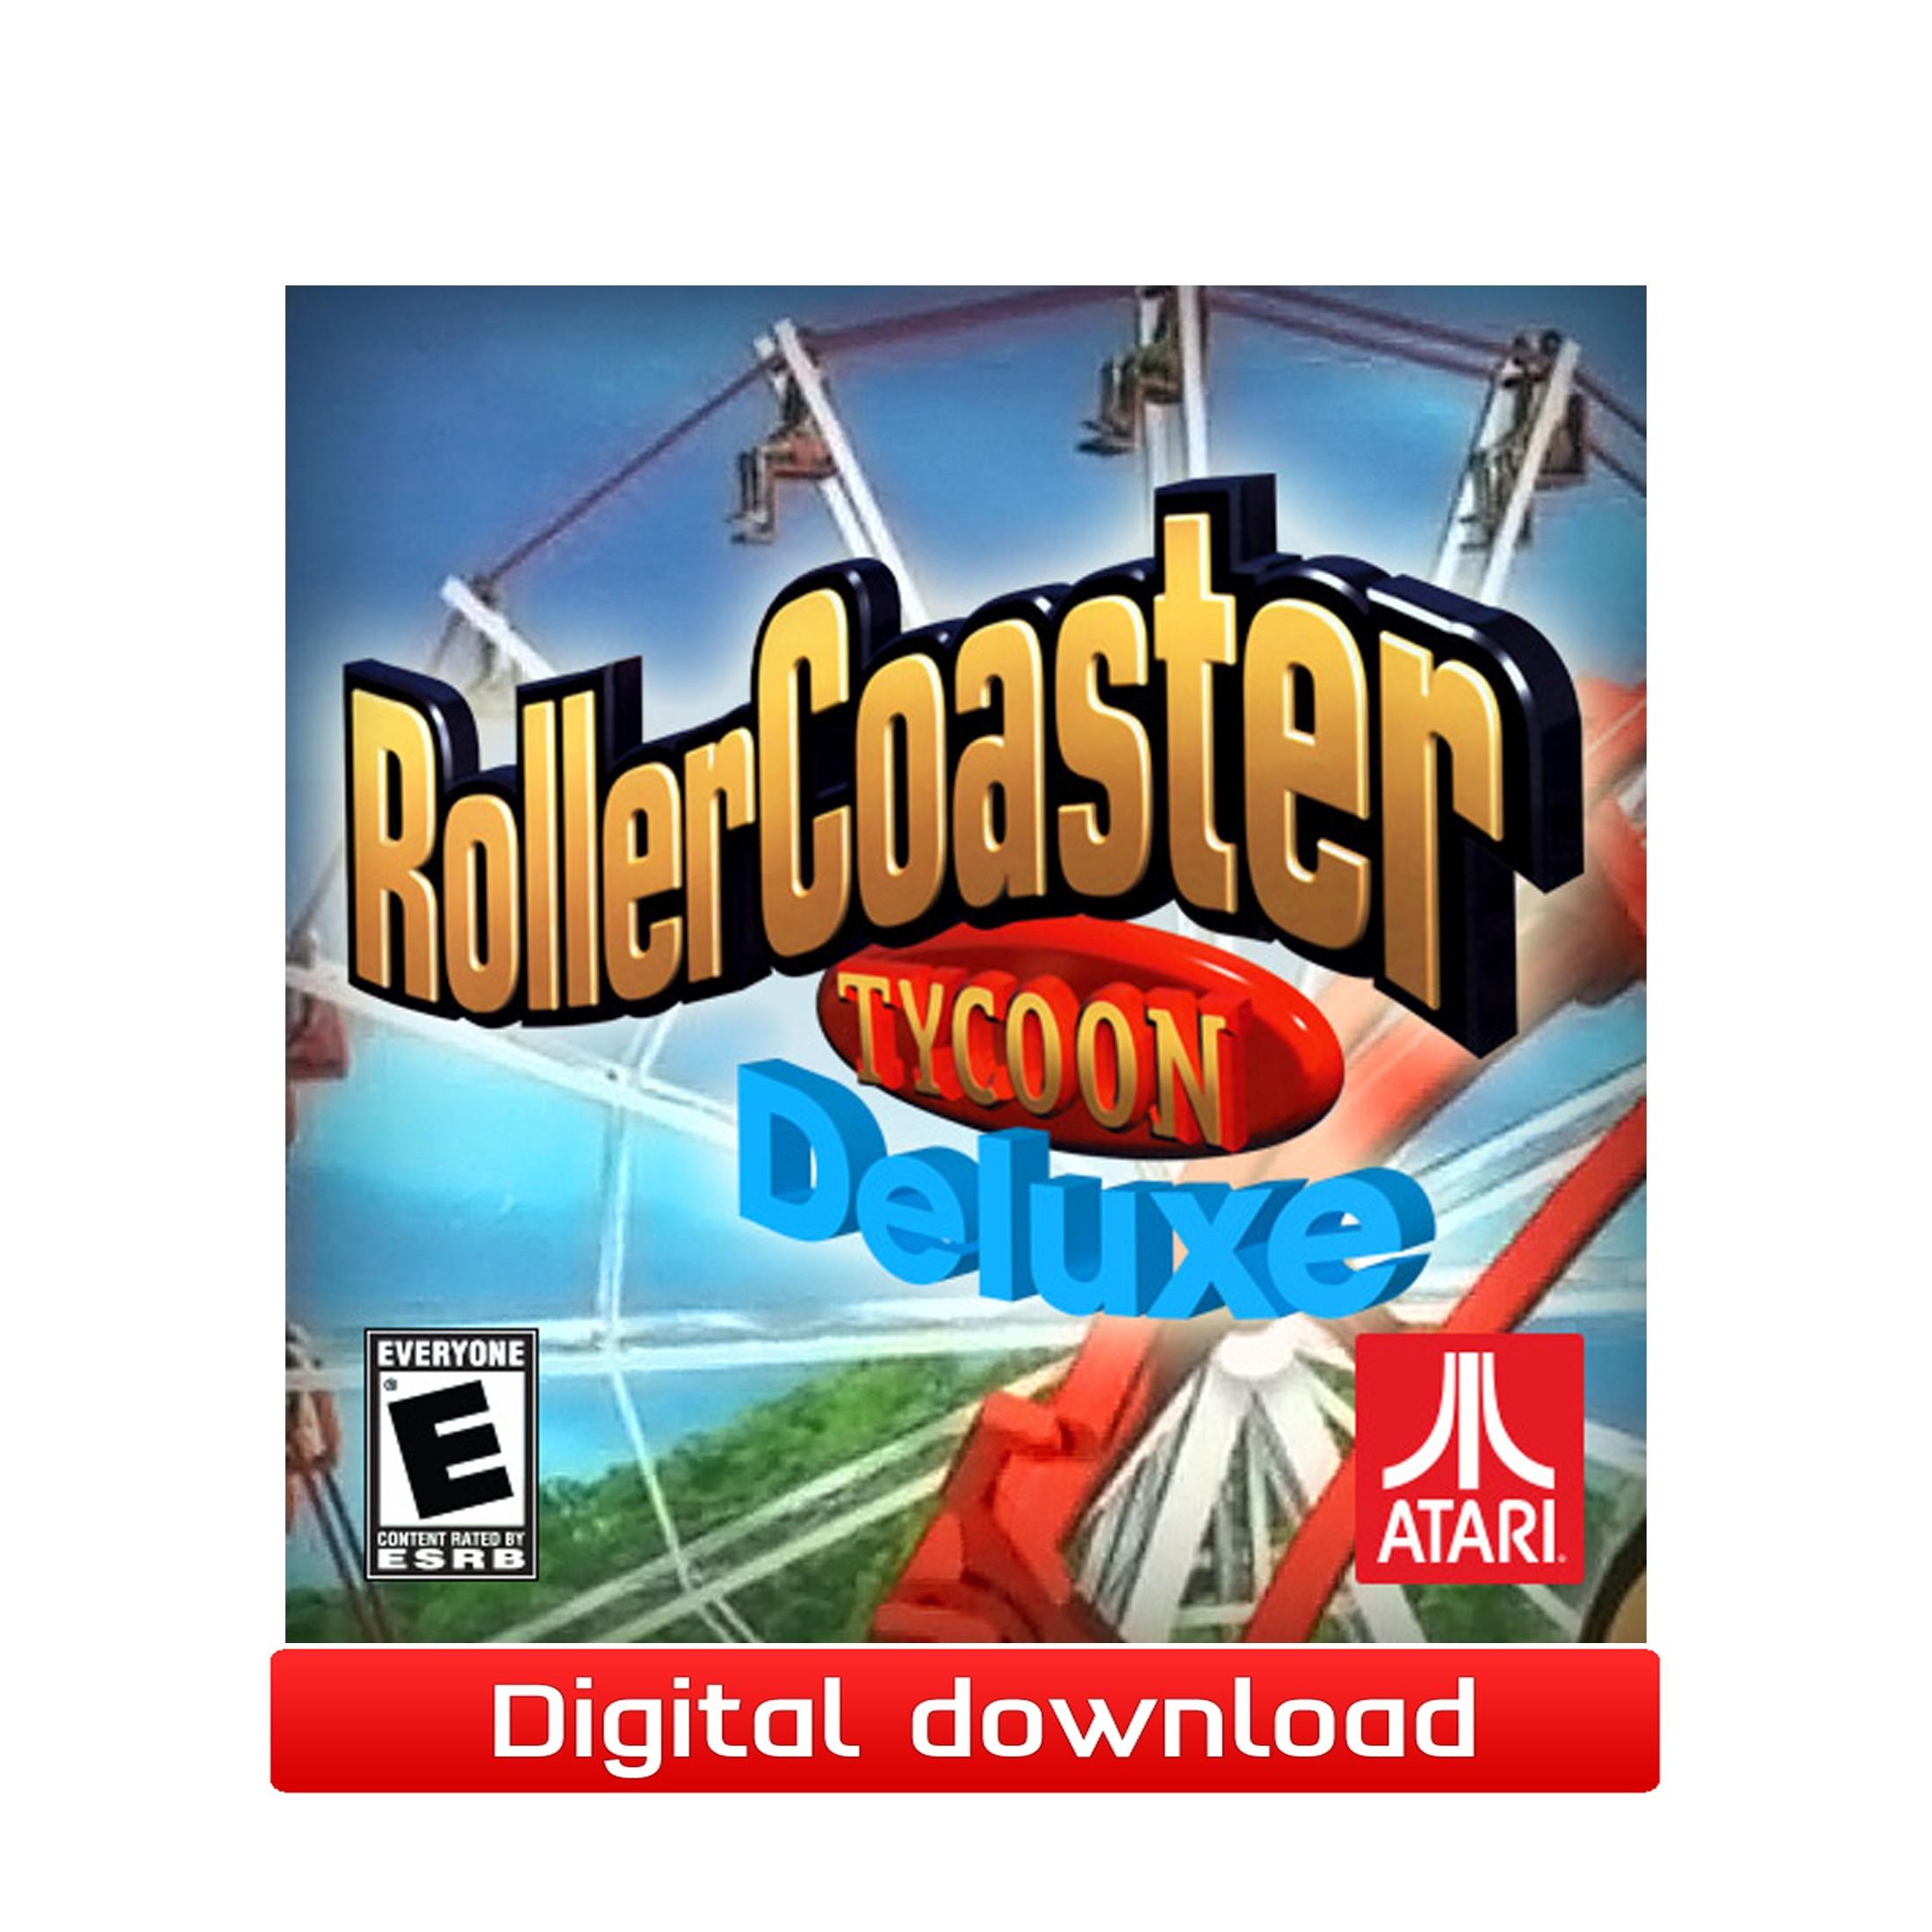 RollerCoaster Tycoon Deluxe (PC nedlastning) PCDD37174